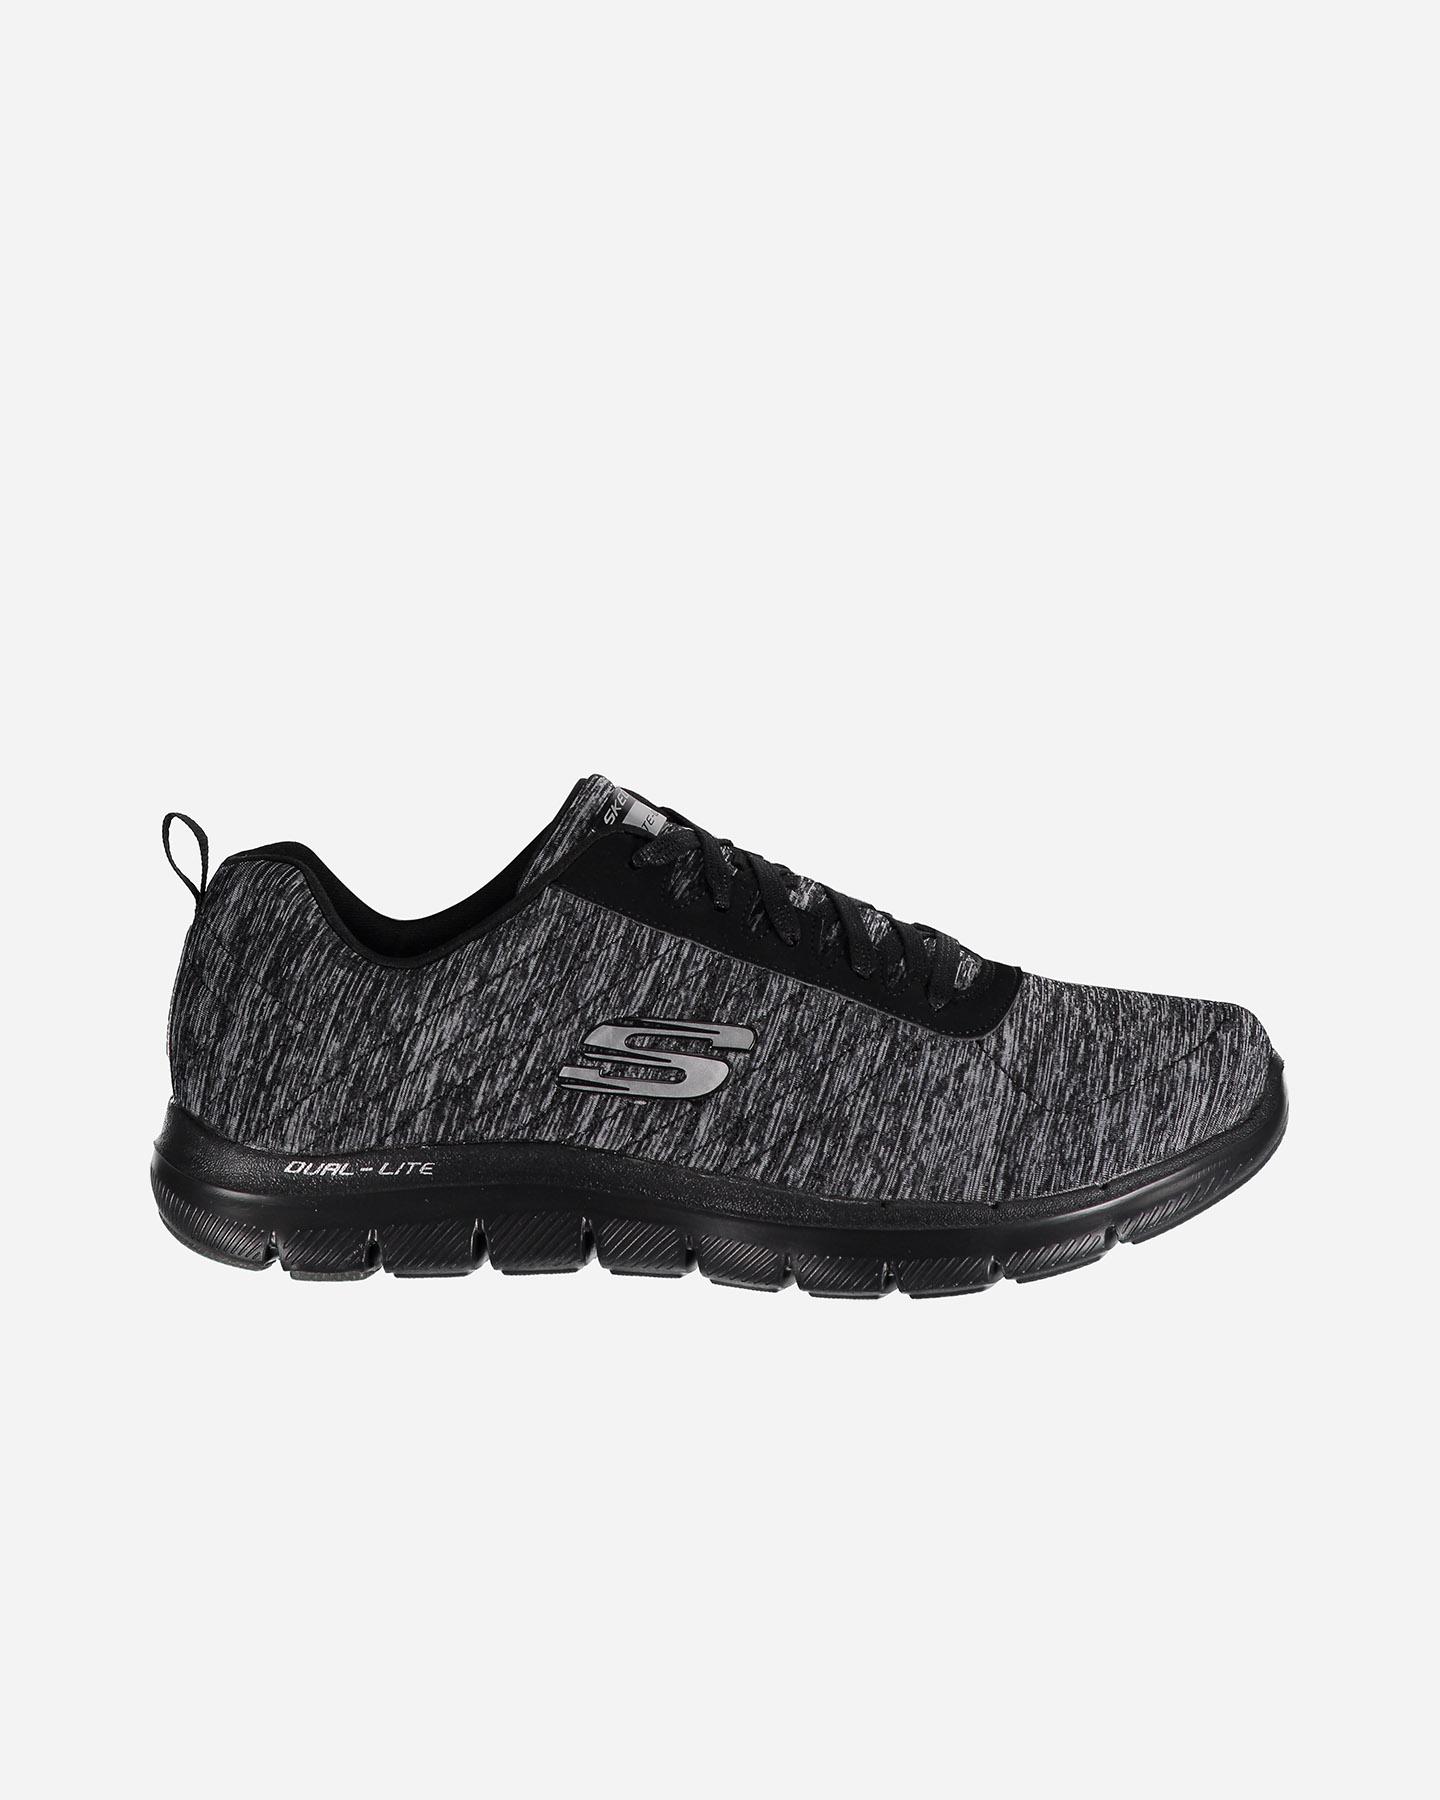 412dd440a0855 Acquista skechers scarpe - OFF51% sconti